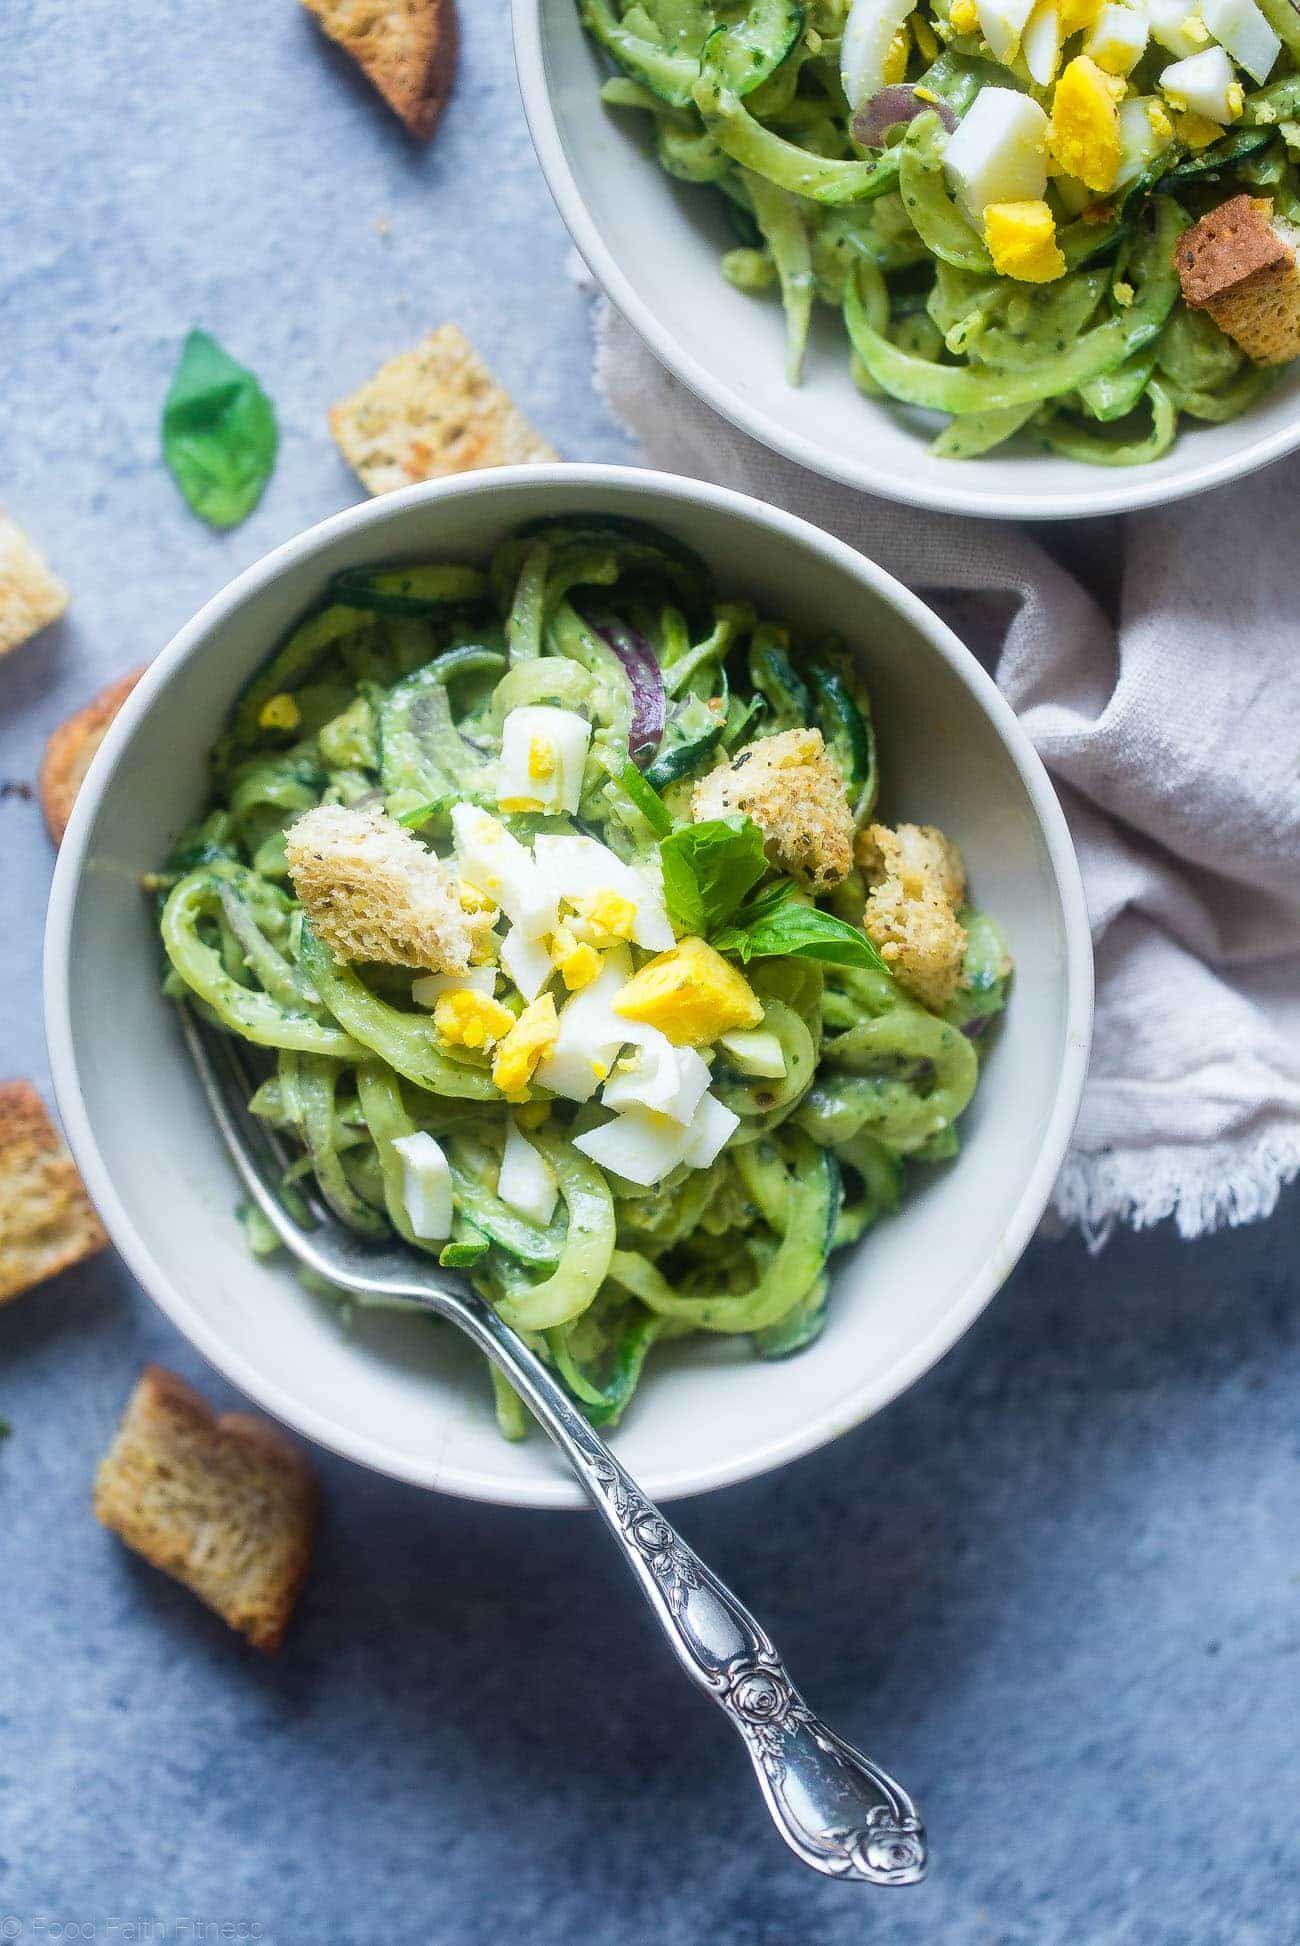 Avocado Pesto Zucchini Noodle Pasta Salad This gluten